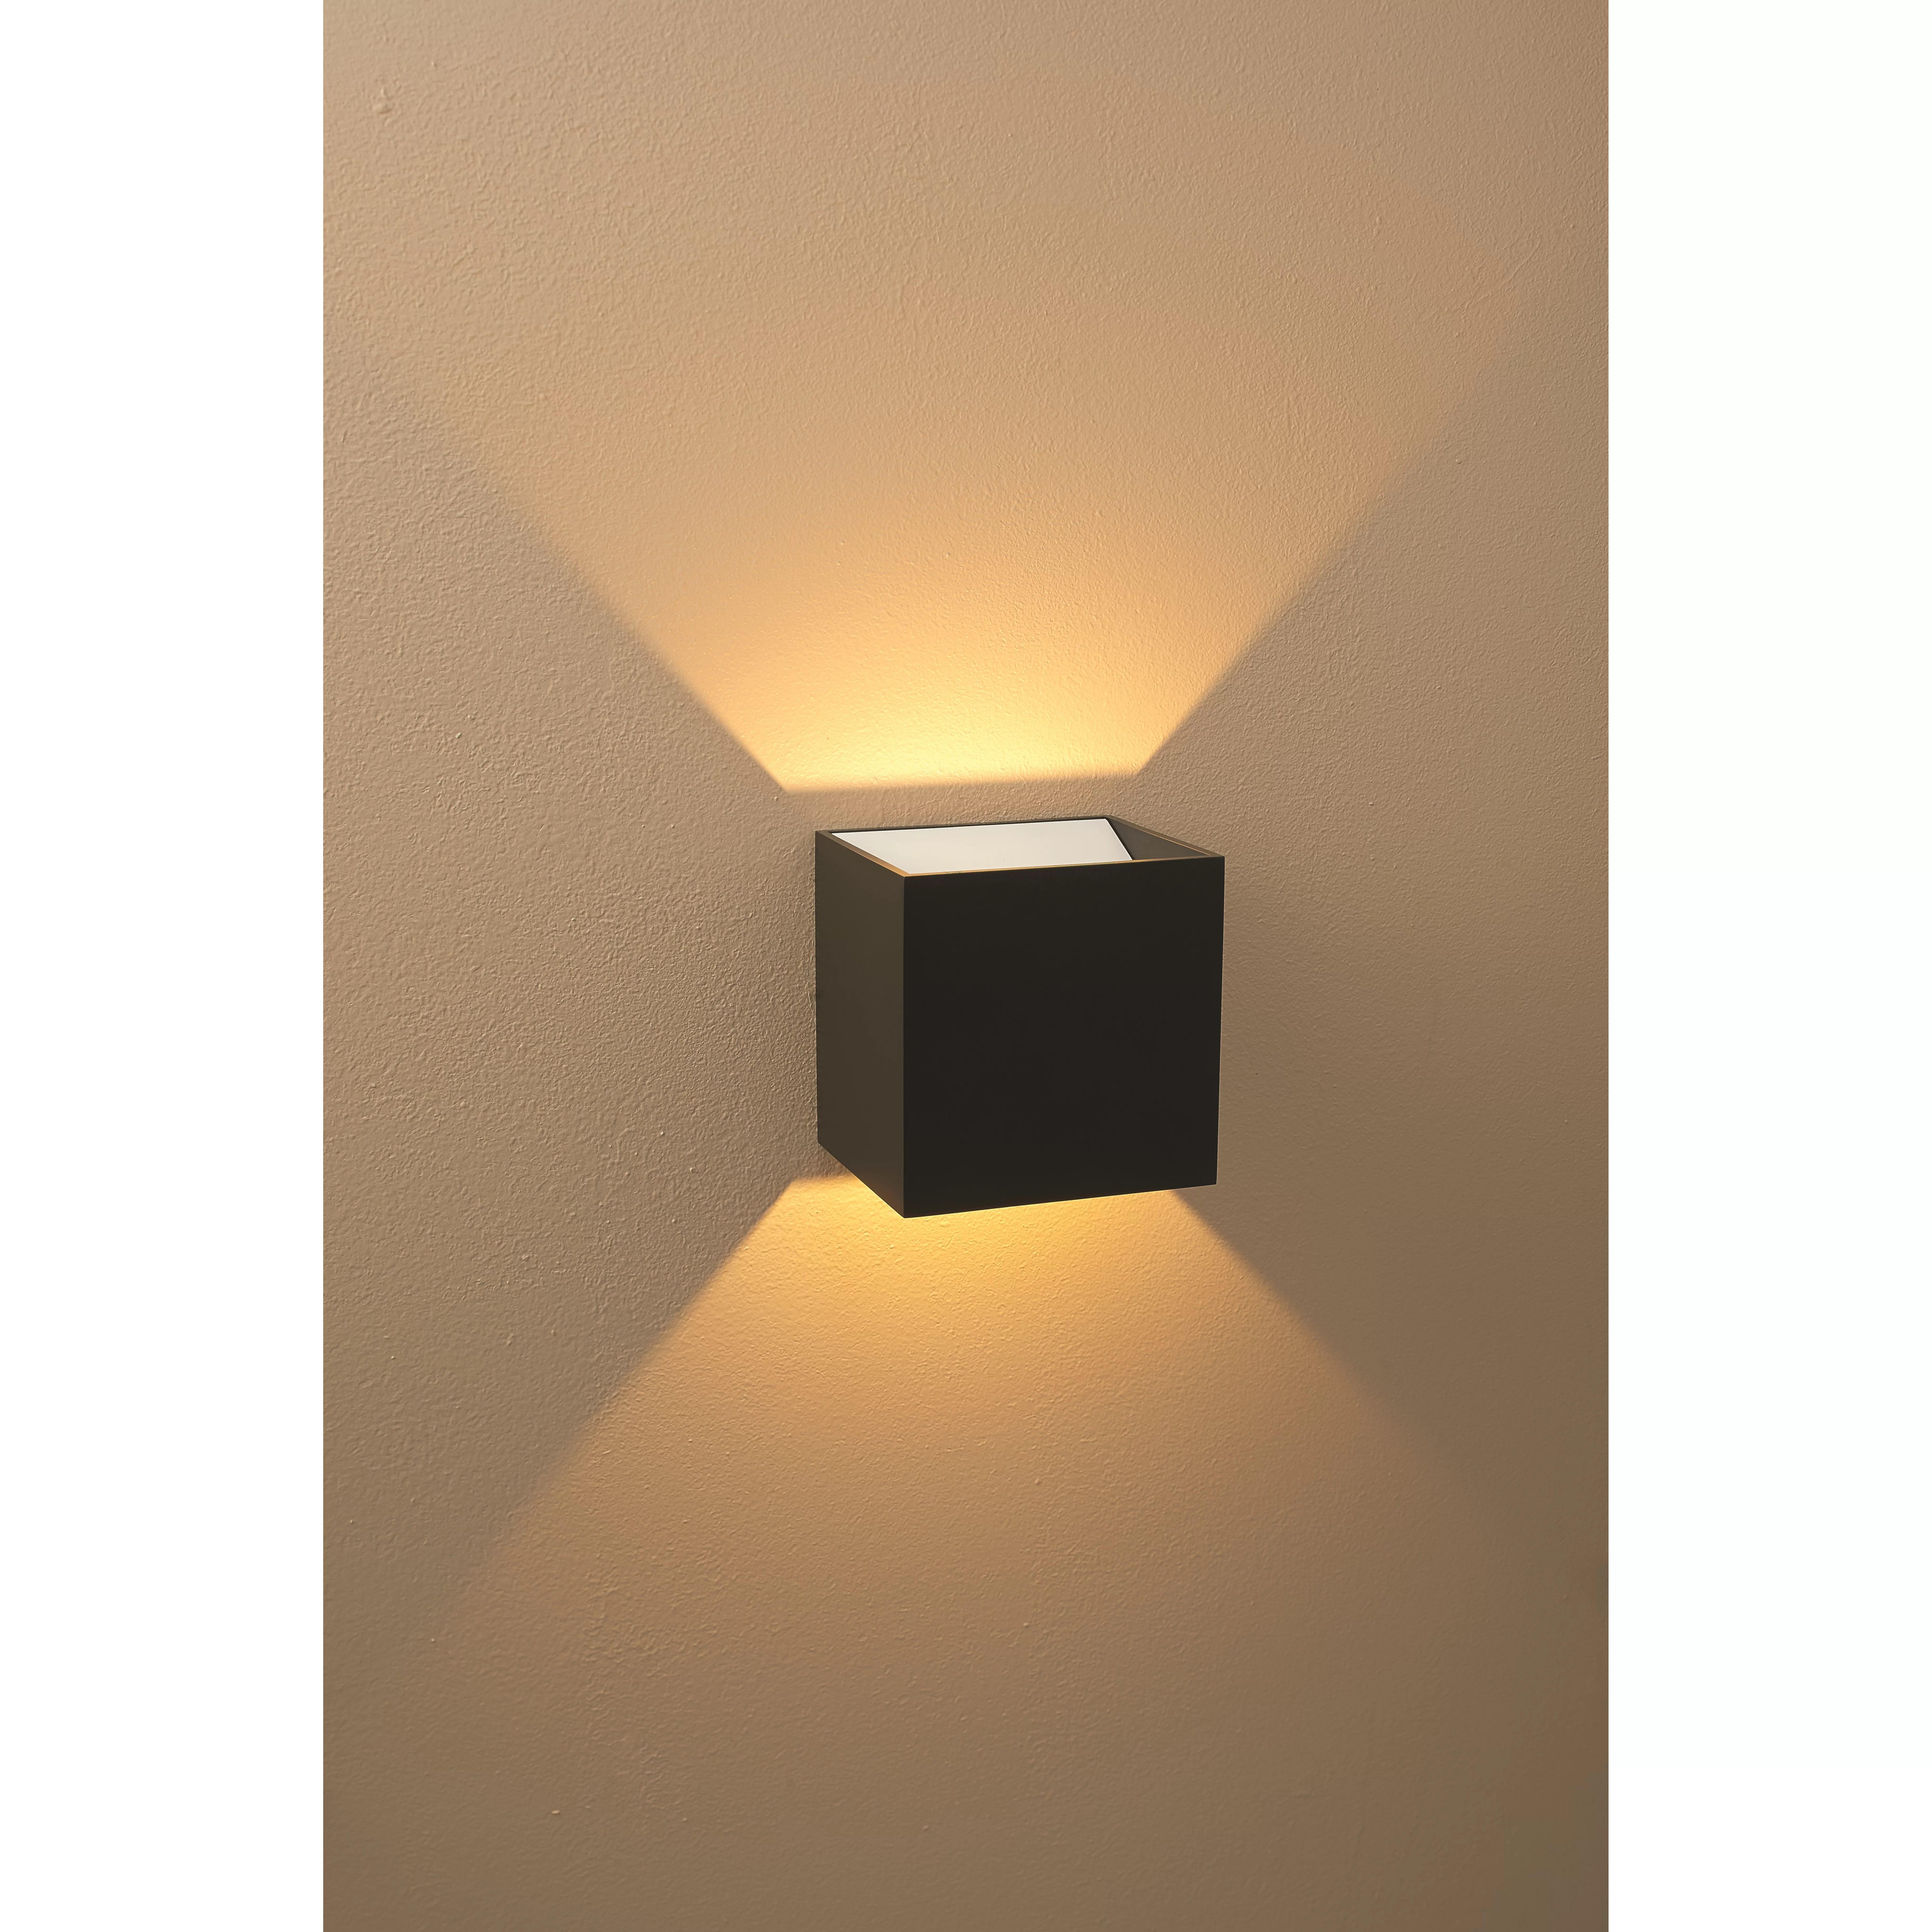 Bruck QB LED Wall Sconce & Reviews